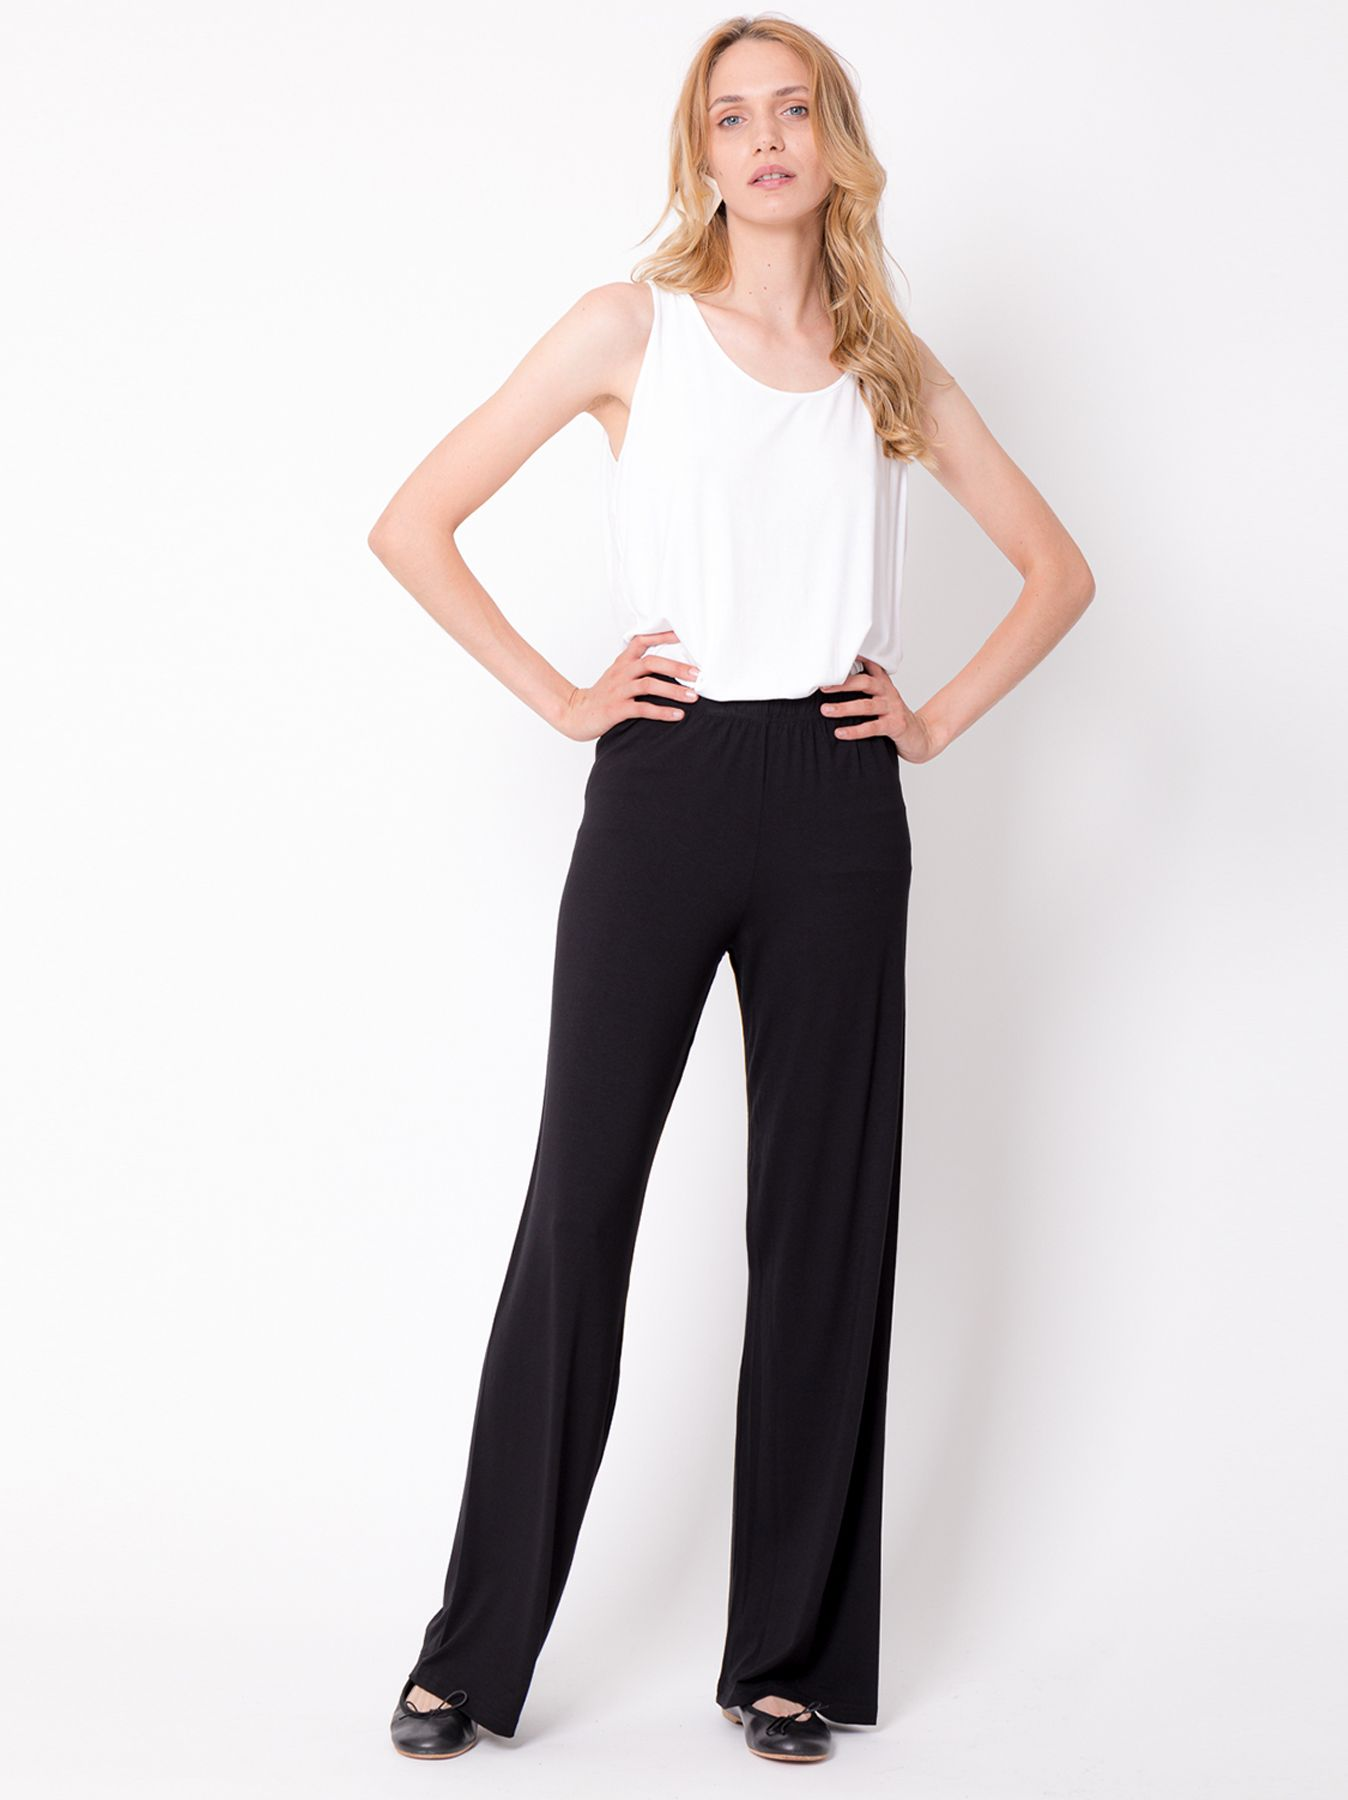 Pantalone elastico NERO